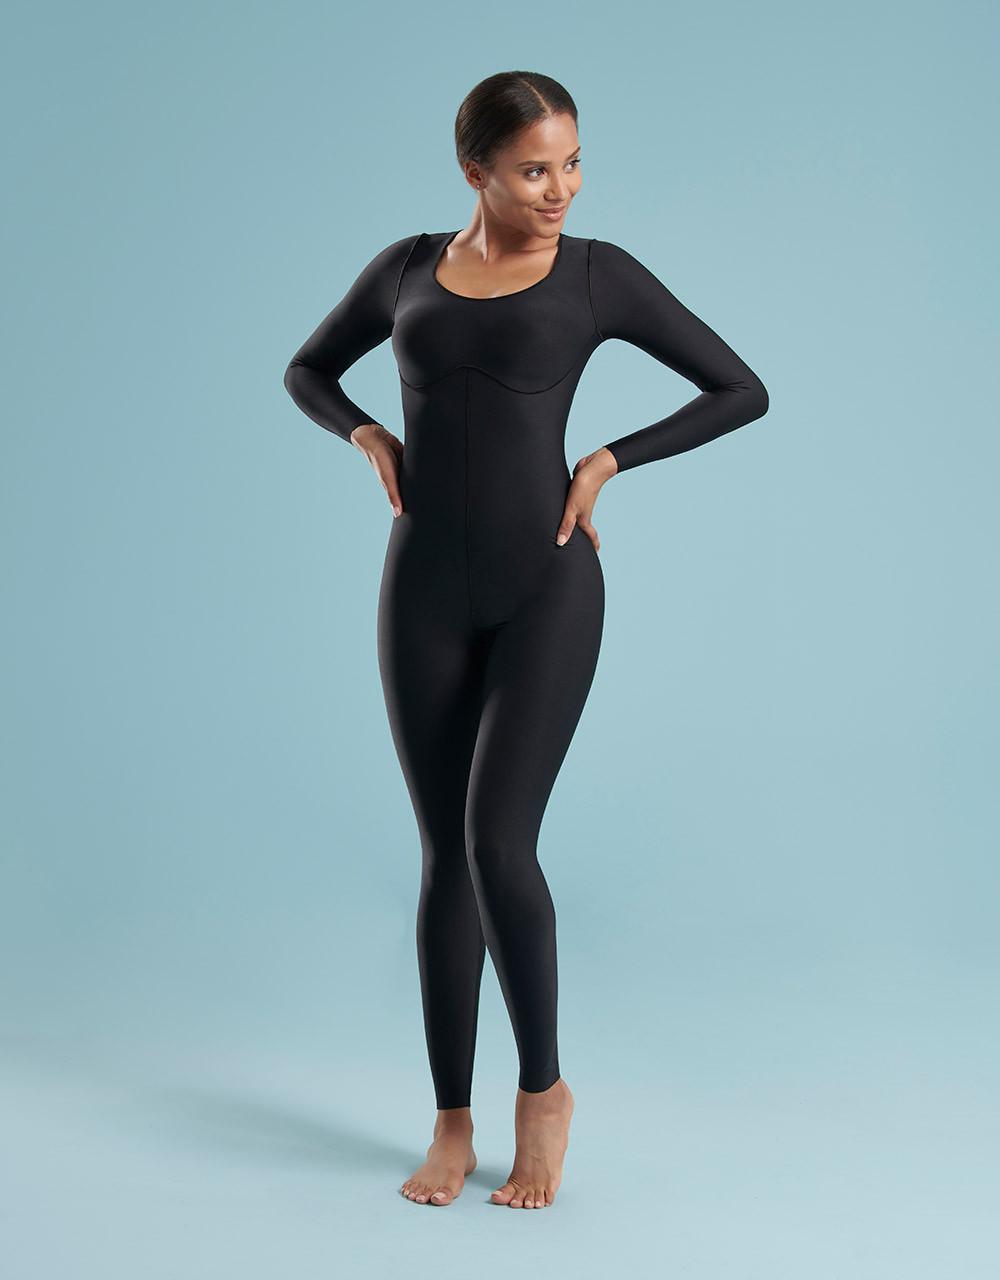 Marena Shape VA-01 VerAmor long-sleeve compression bodysuit 0fa02b6f4268